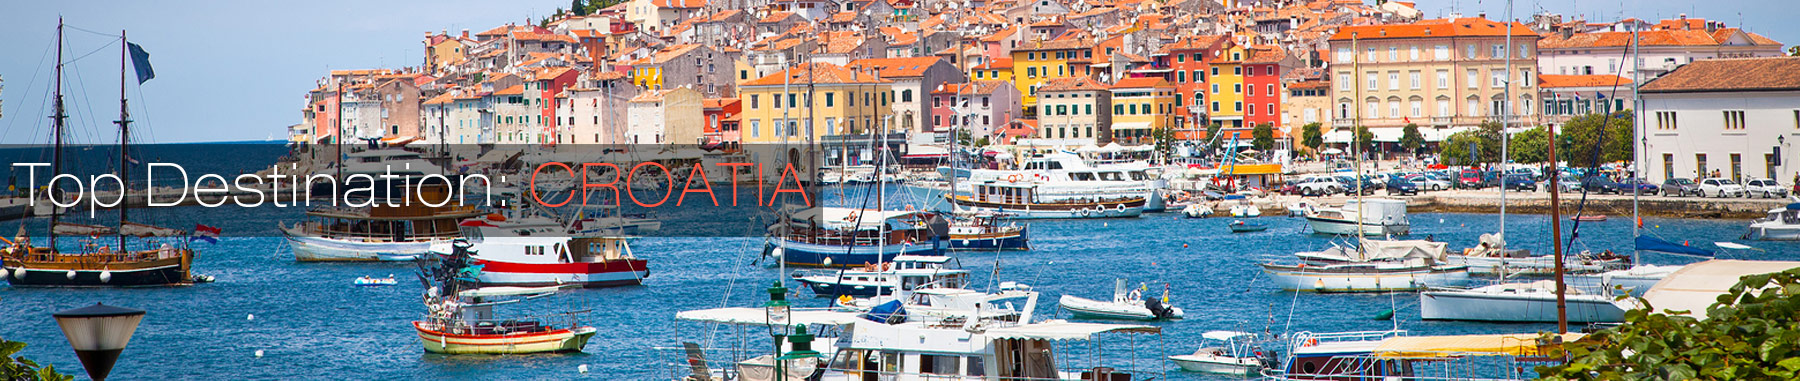 Search for rental properties in Croatia